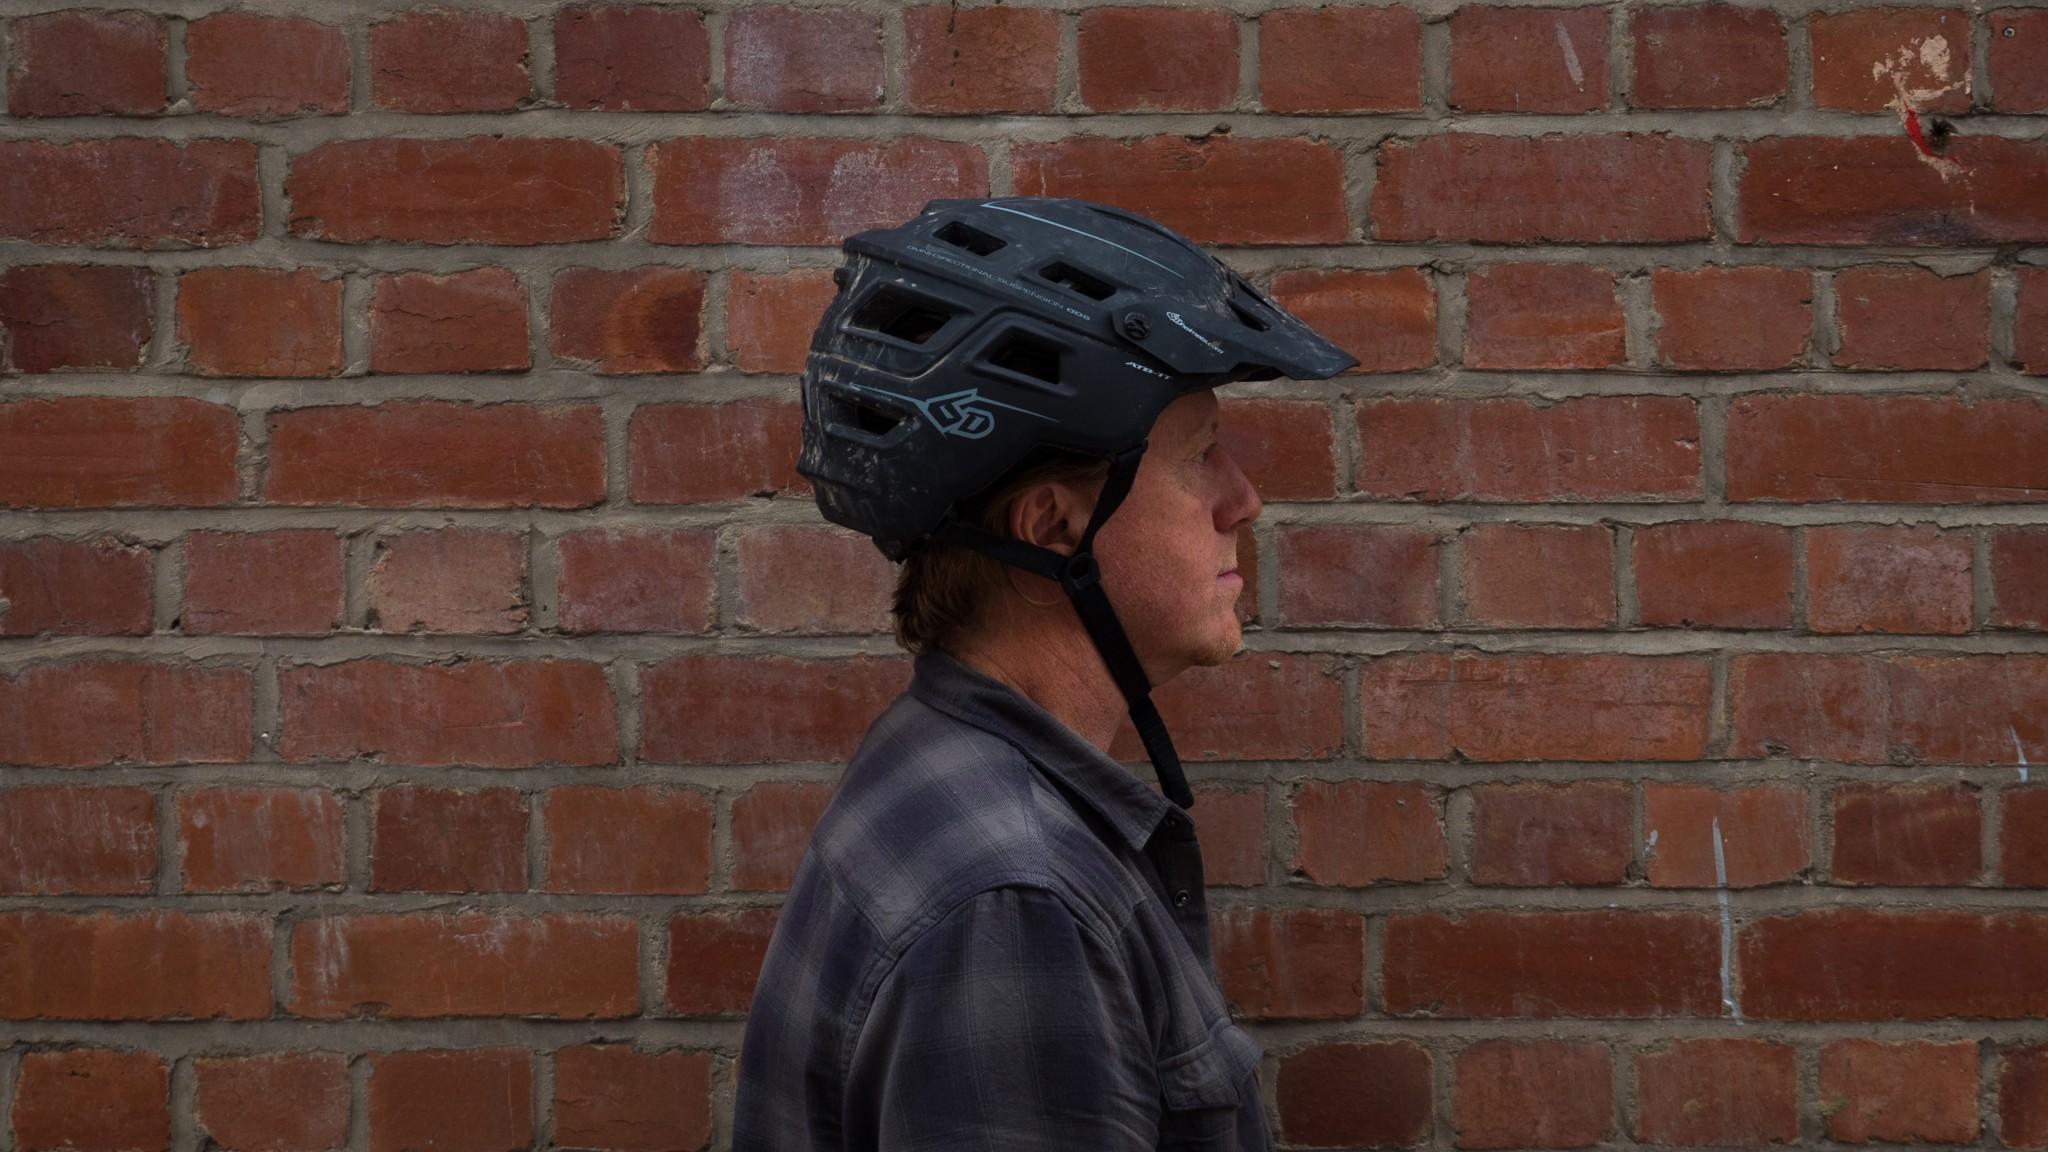 6d Usd Atb 1t Trail Helmet 2016 Mountain Bike Reviews